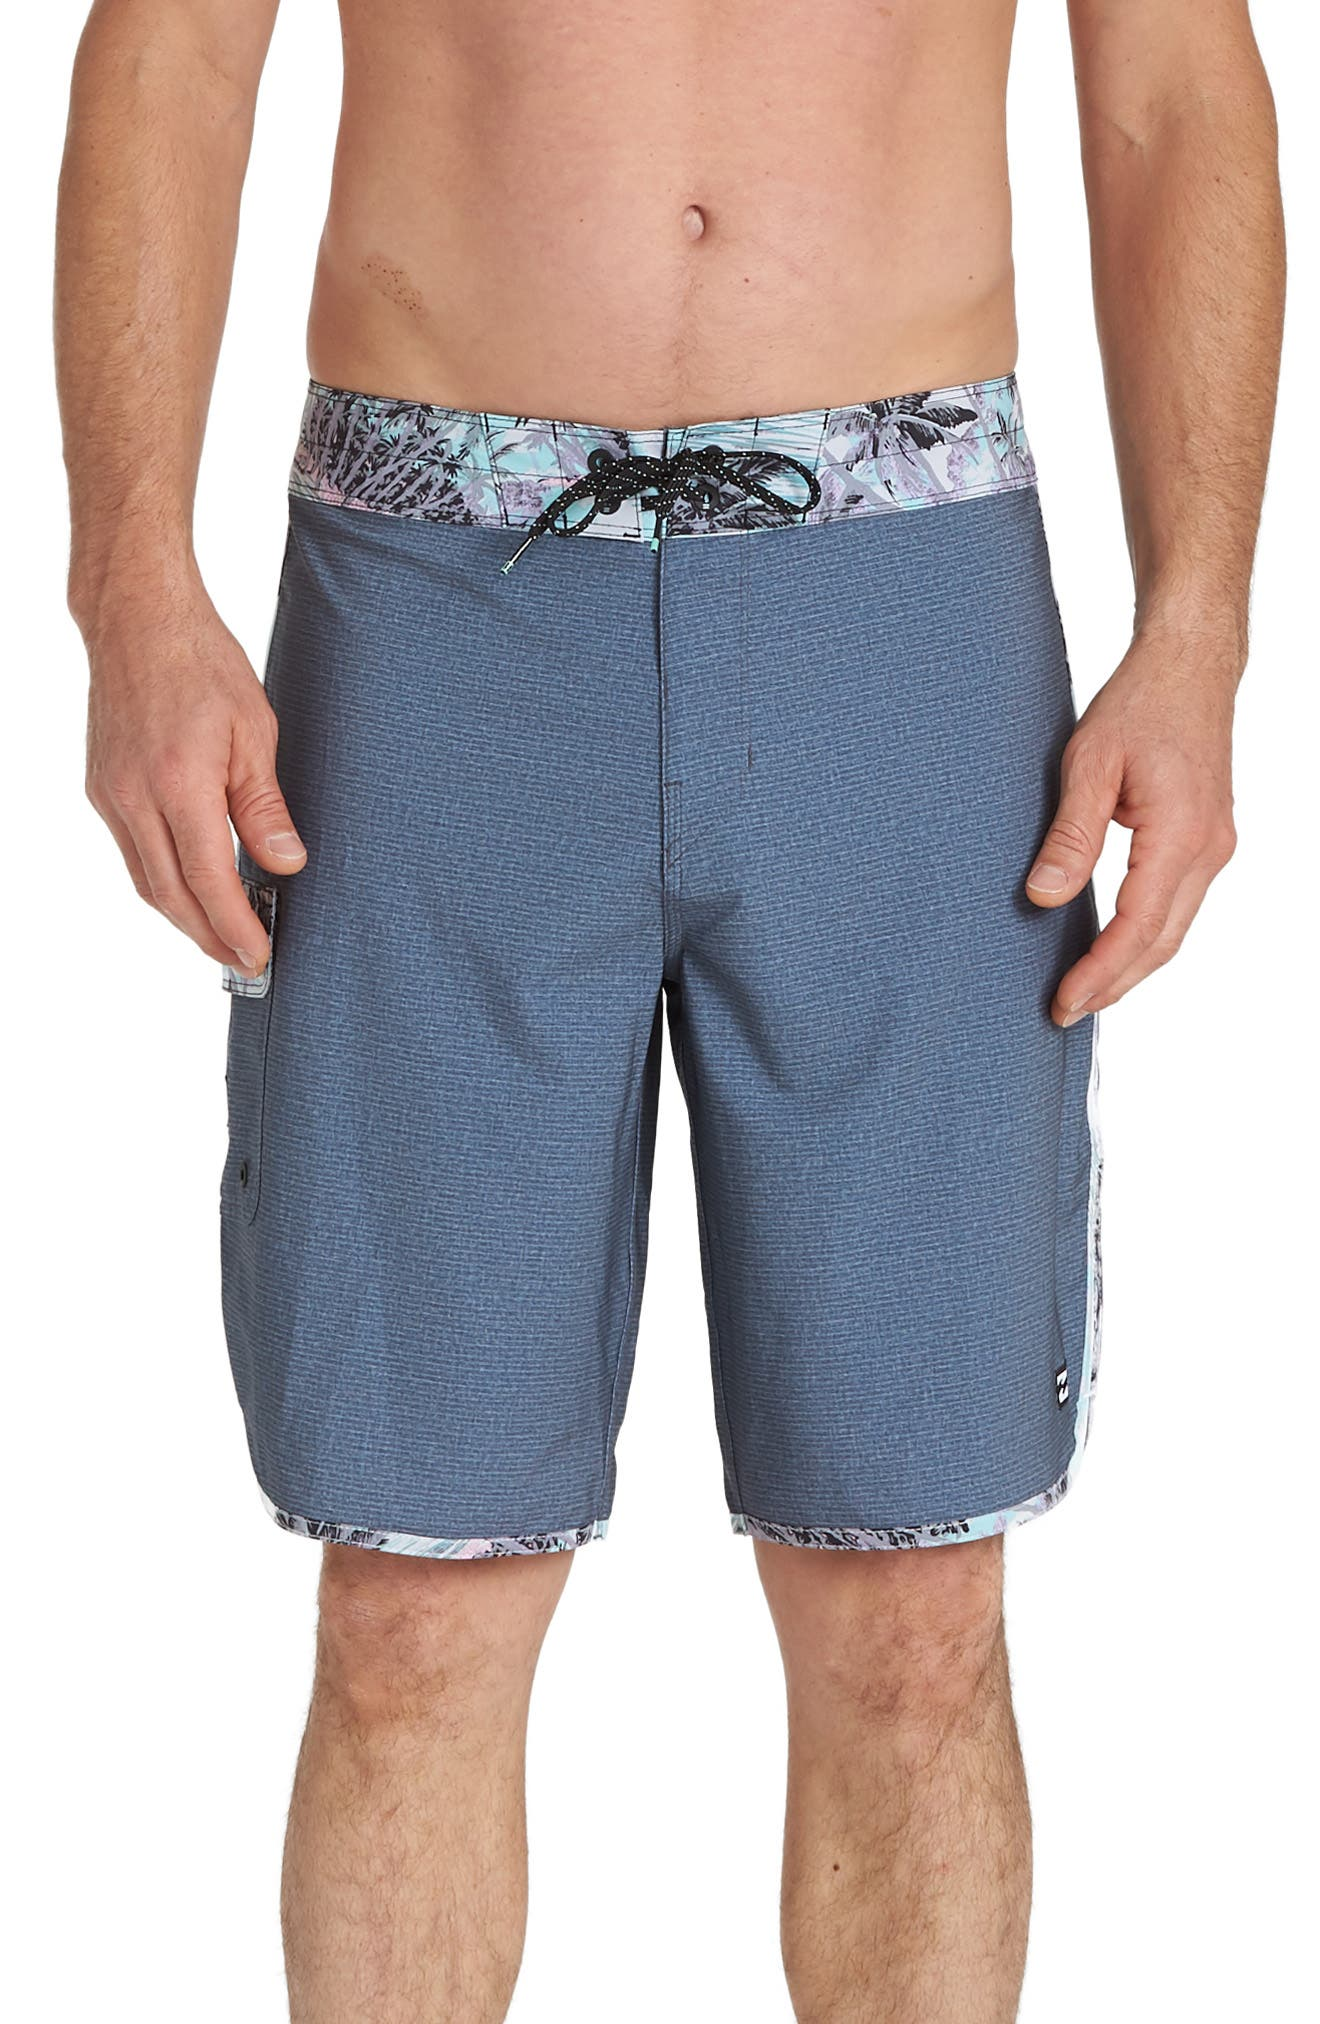 Billabong 73 Pro Board Shorts, Grey